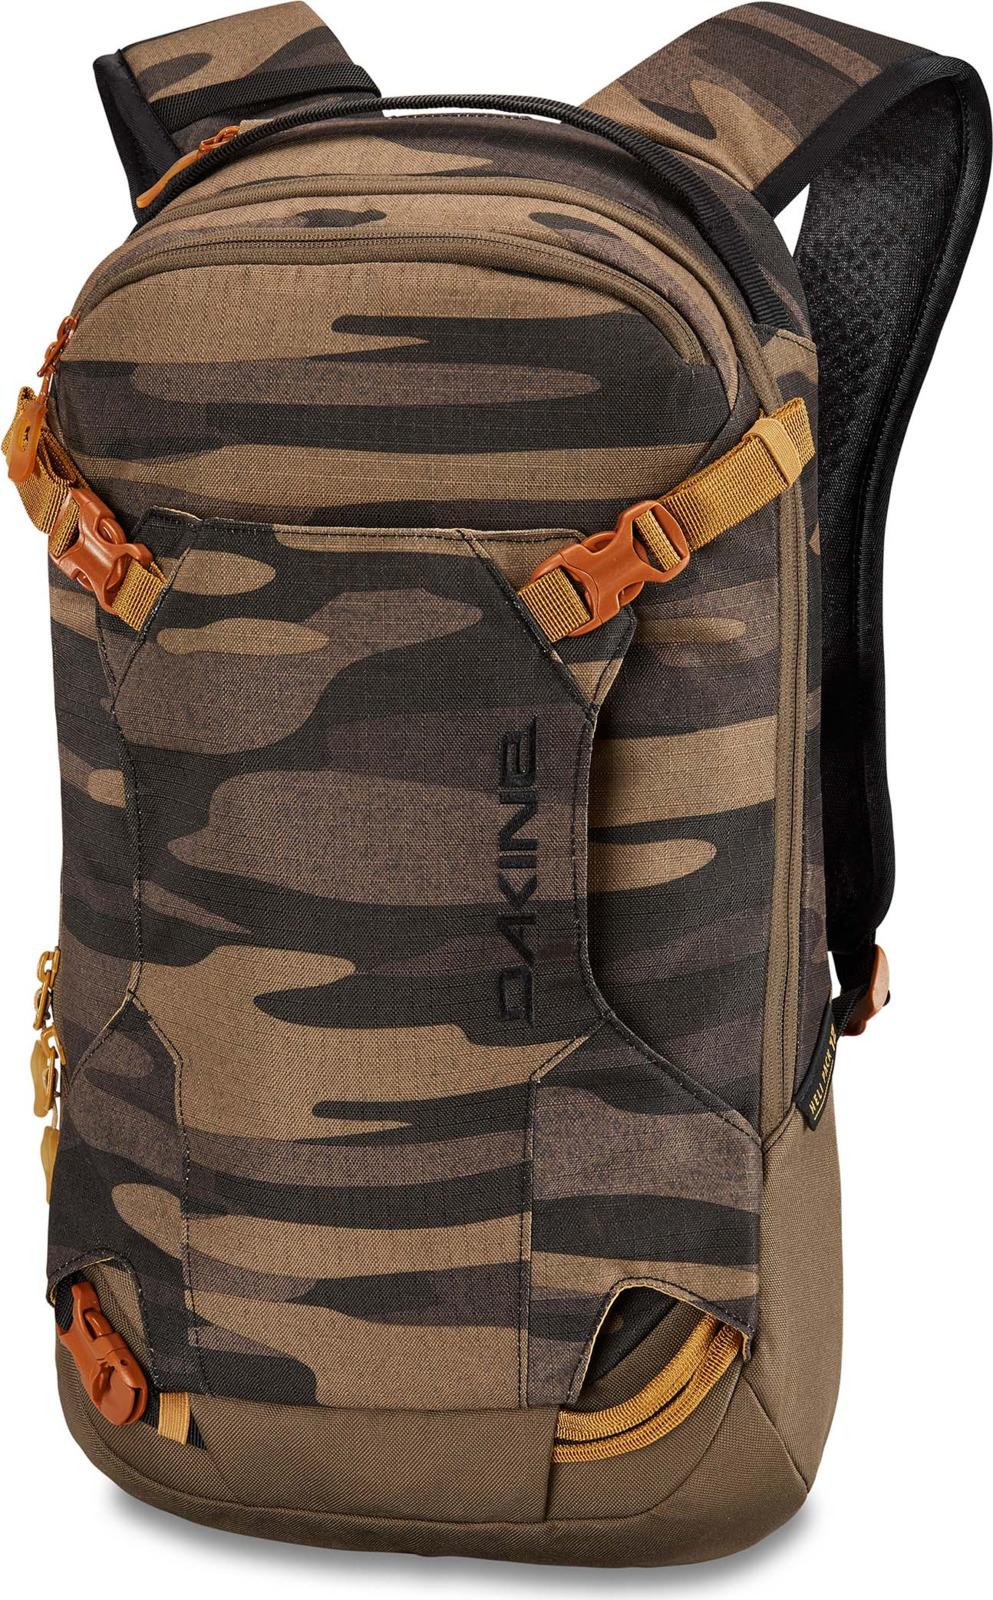 Рюкзак Dakine Heli Pack, цвет: камуфляж, 12 л oiwas ноутбук рюкзак мода случайные